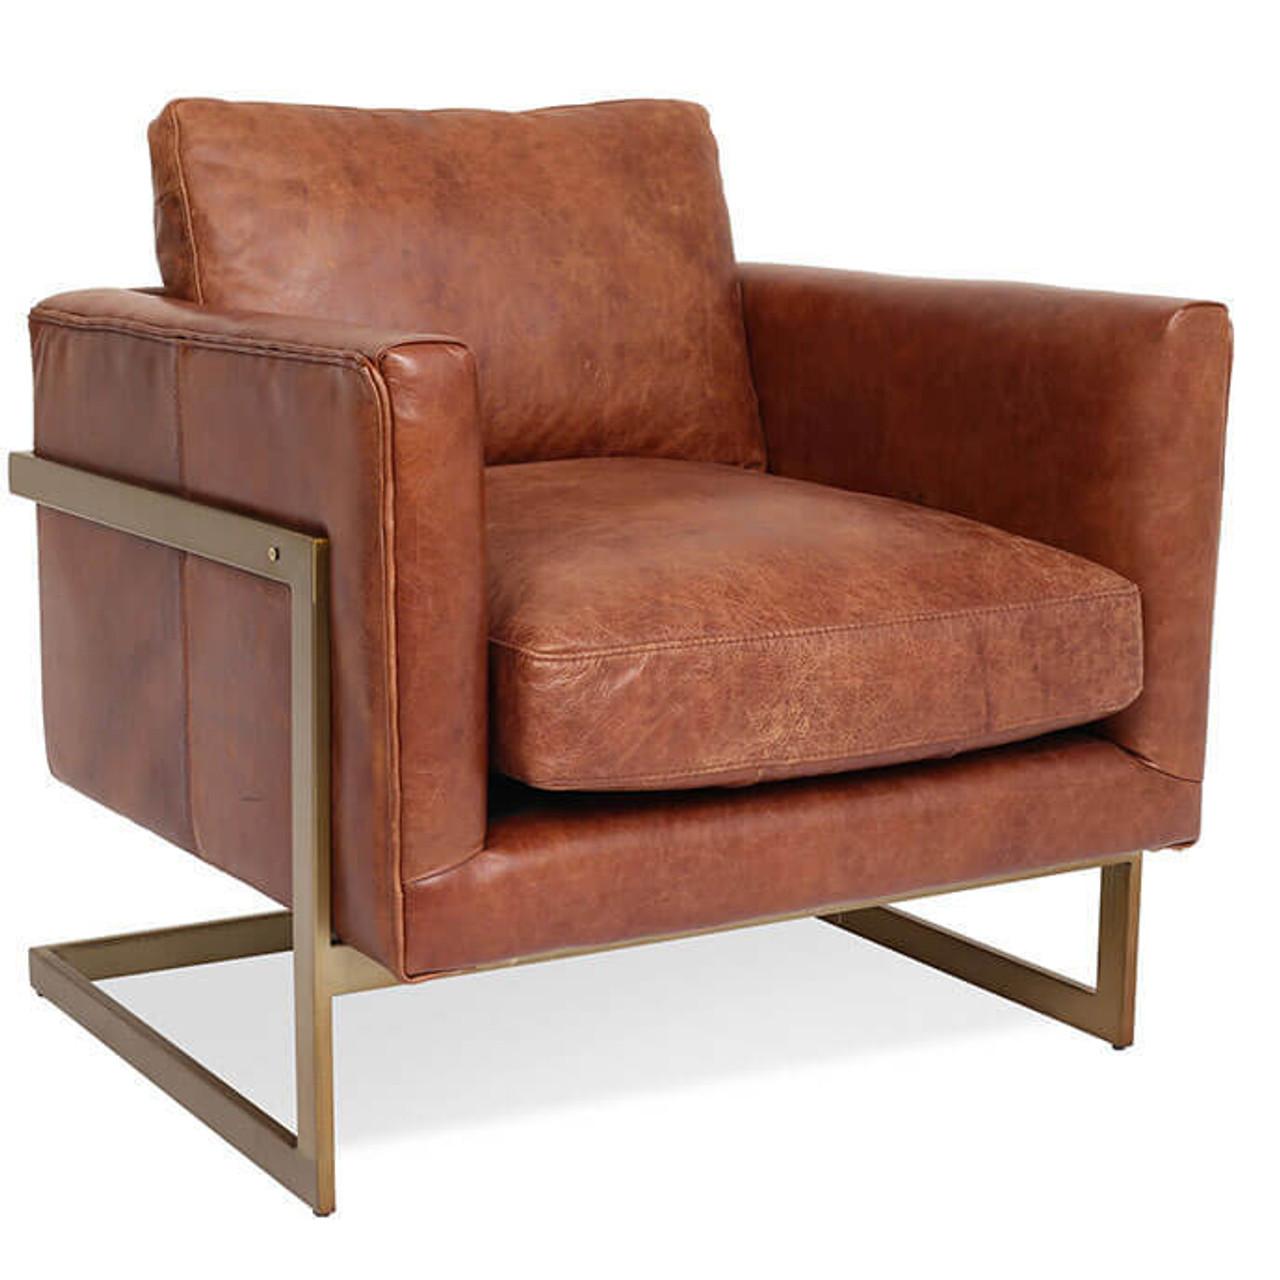 London Modern Cognac Leather Club Chair   Zin Home